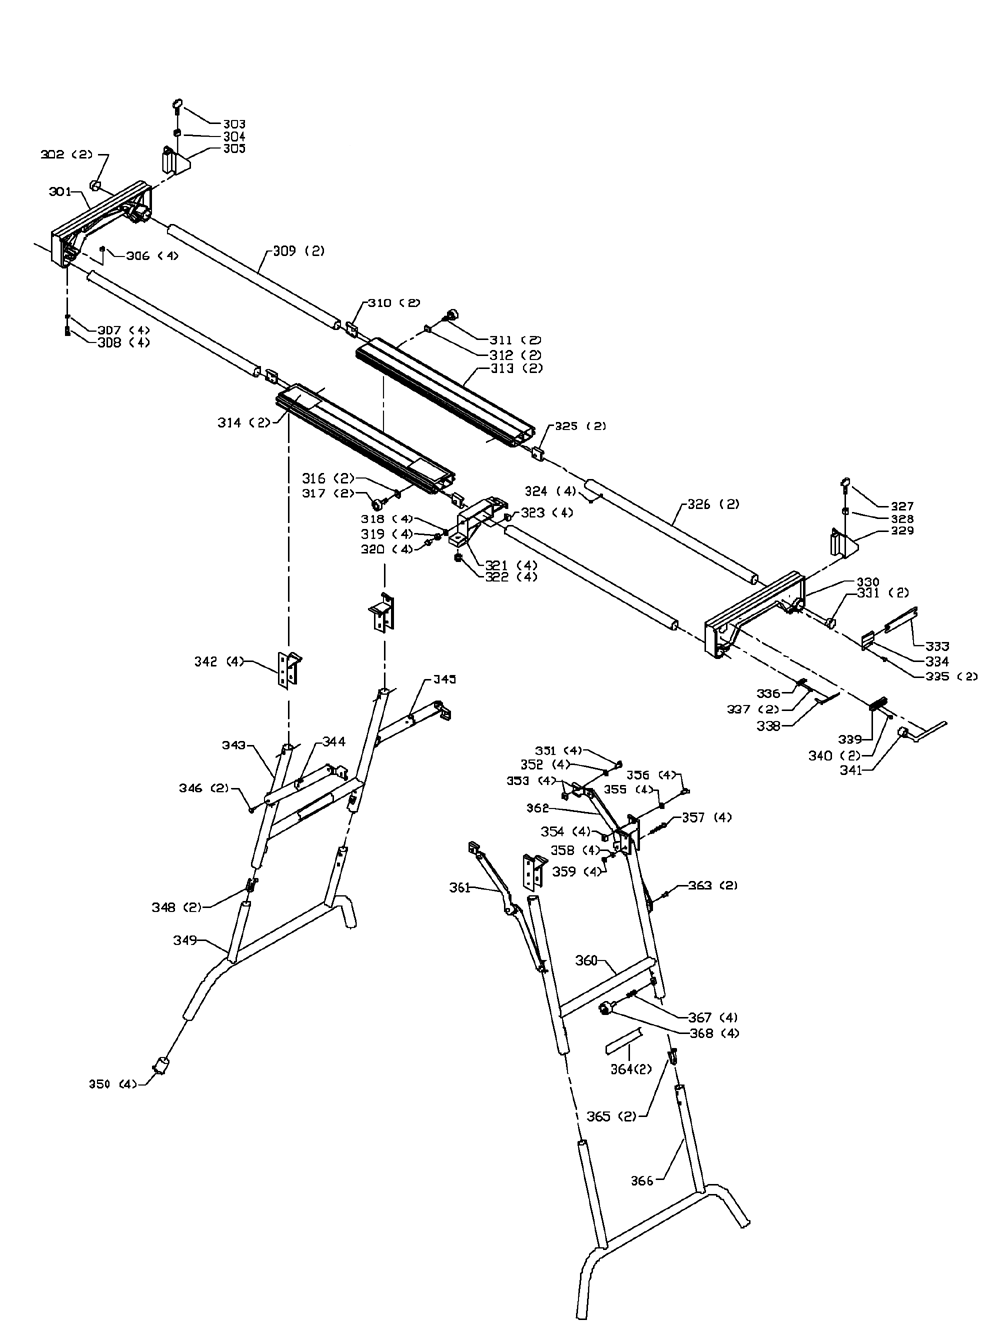 Delta-36-250-Type-2-Parts-1992-PBBreak Down